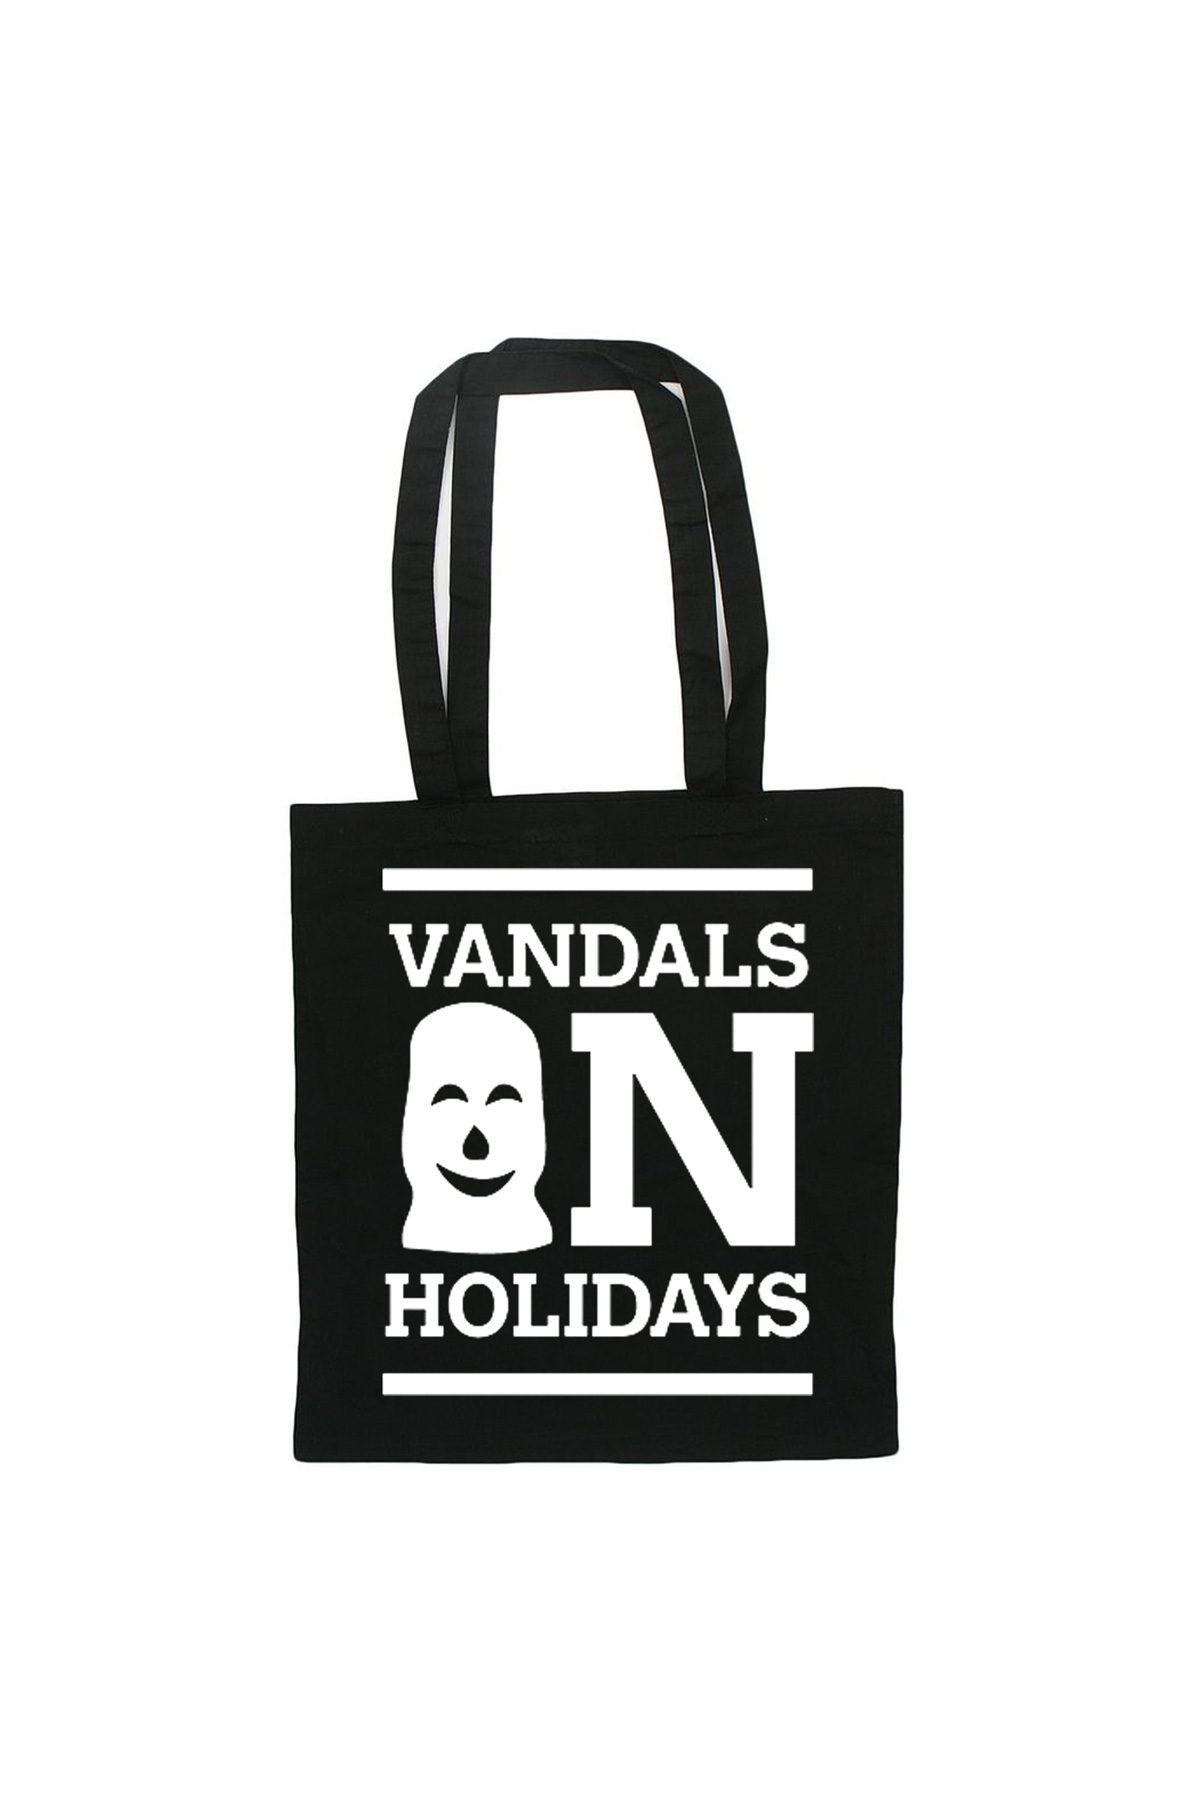 Vandals On Holidays LOGO Cotton Bag